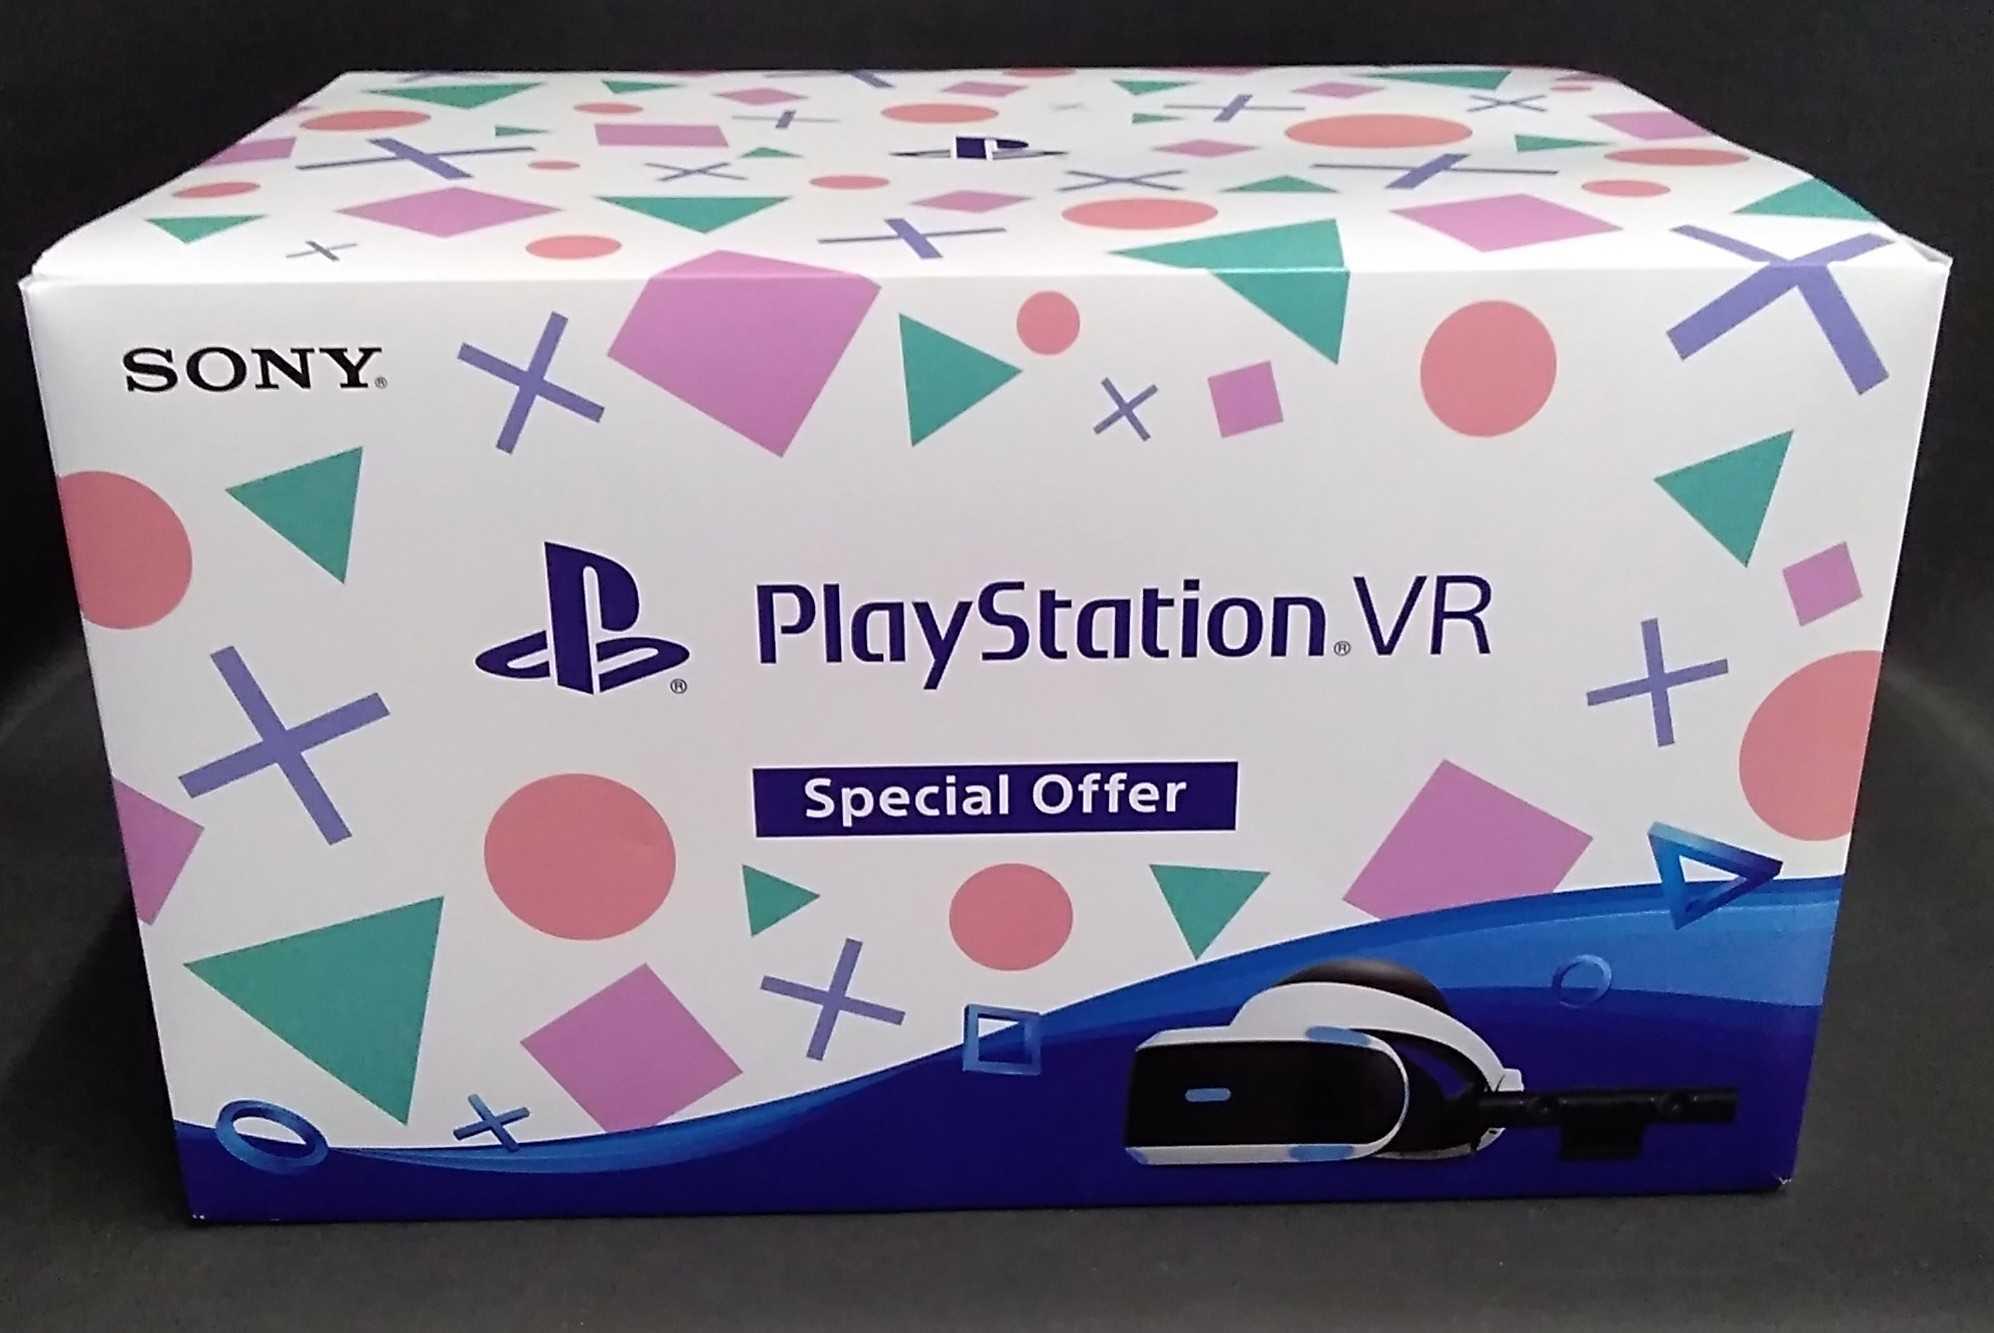 PlaystationVR|SONY